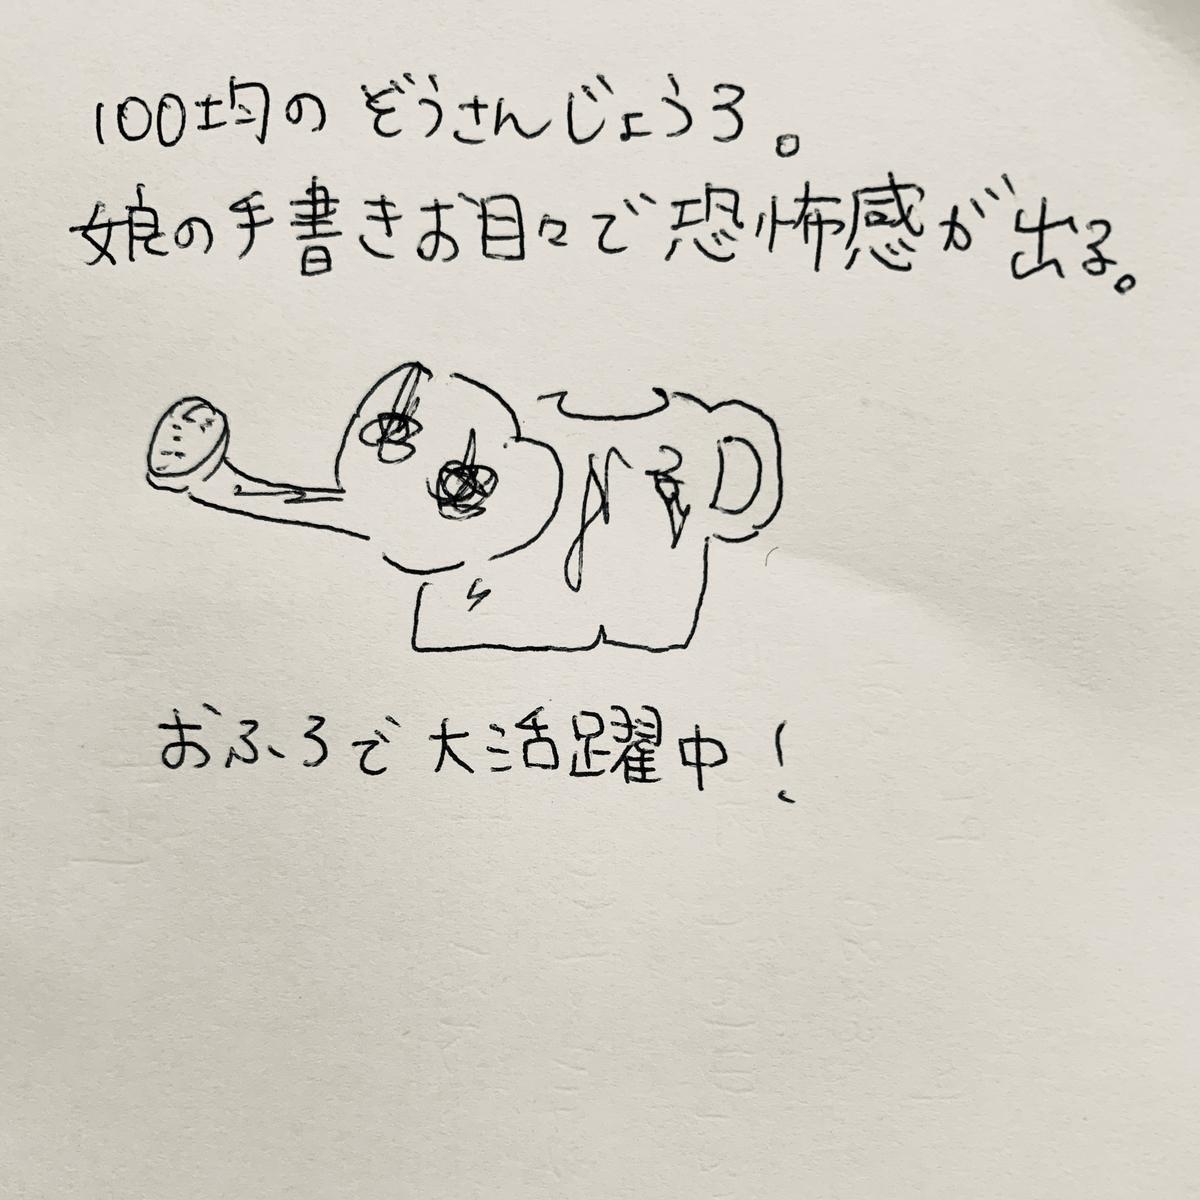 f:id:nananan0:20190523100011j:plain